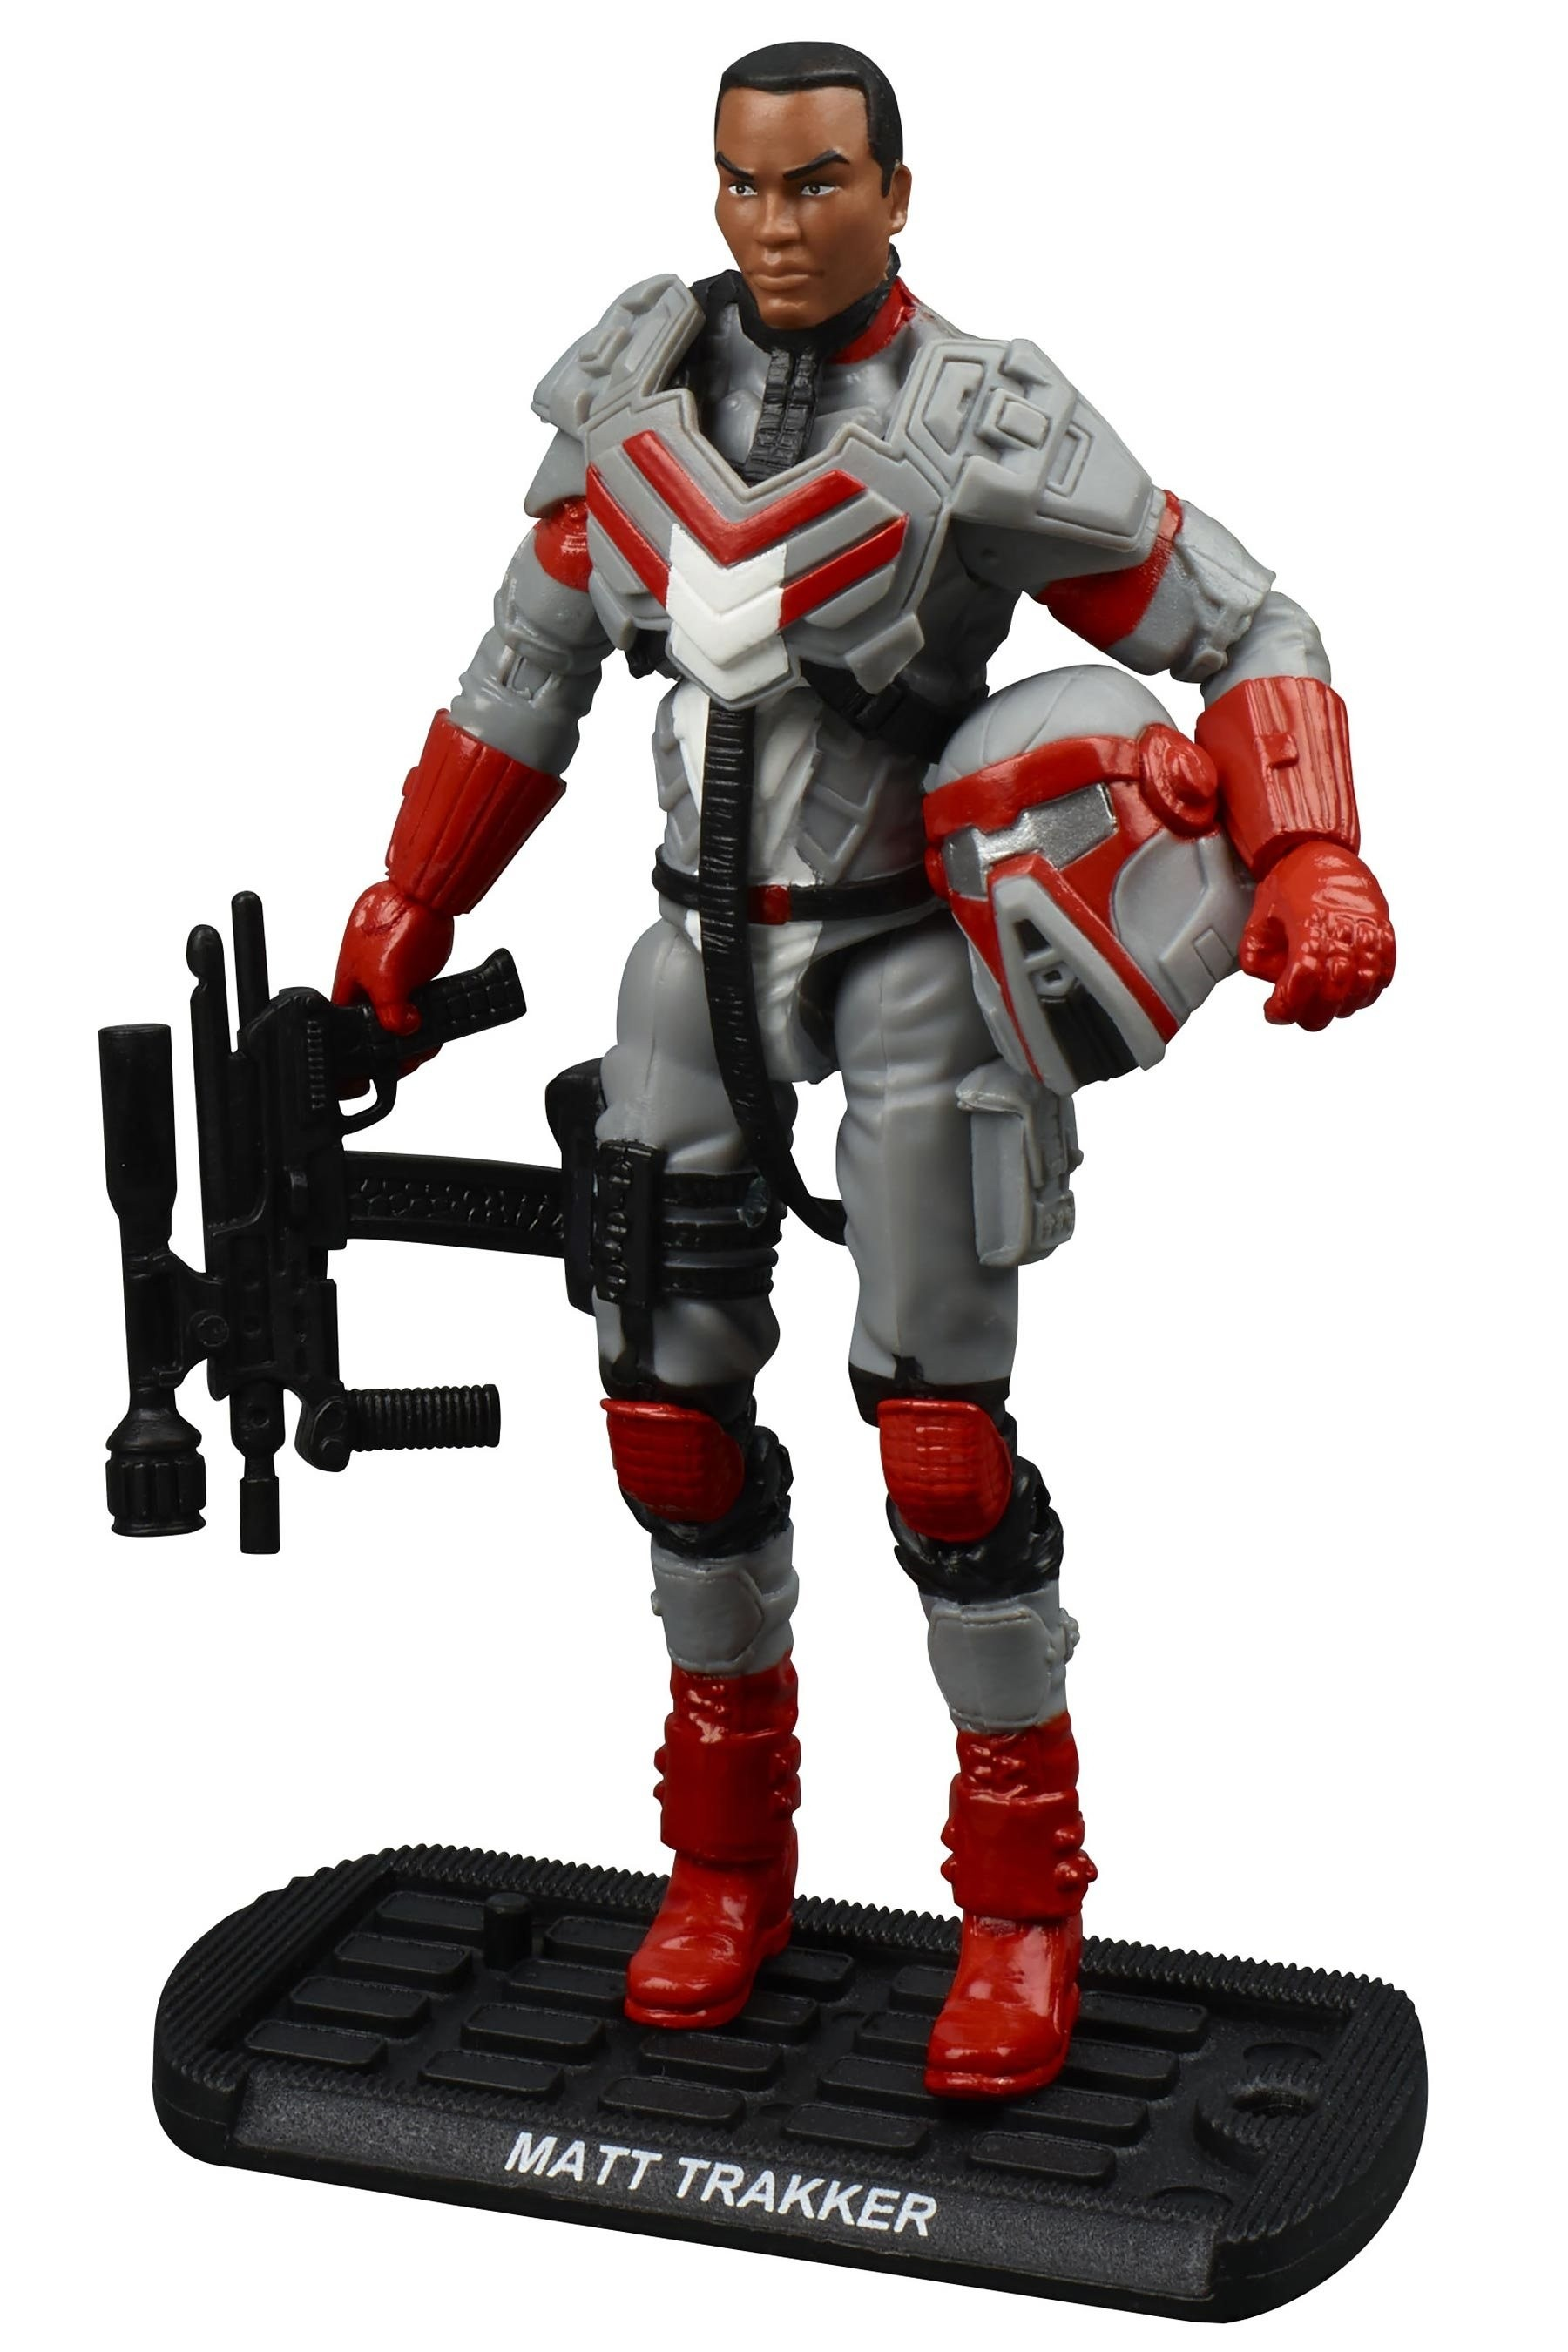 Best Transformers Toys And Action Figures : Hasbro sdcc idw revolution m a s k matt trakker action